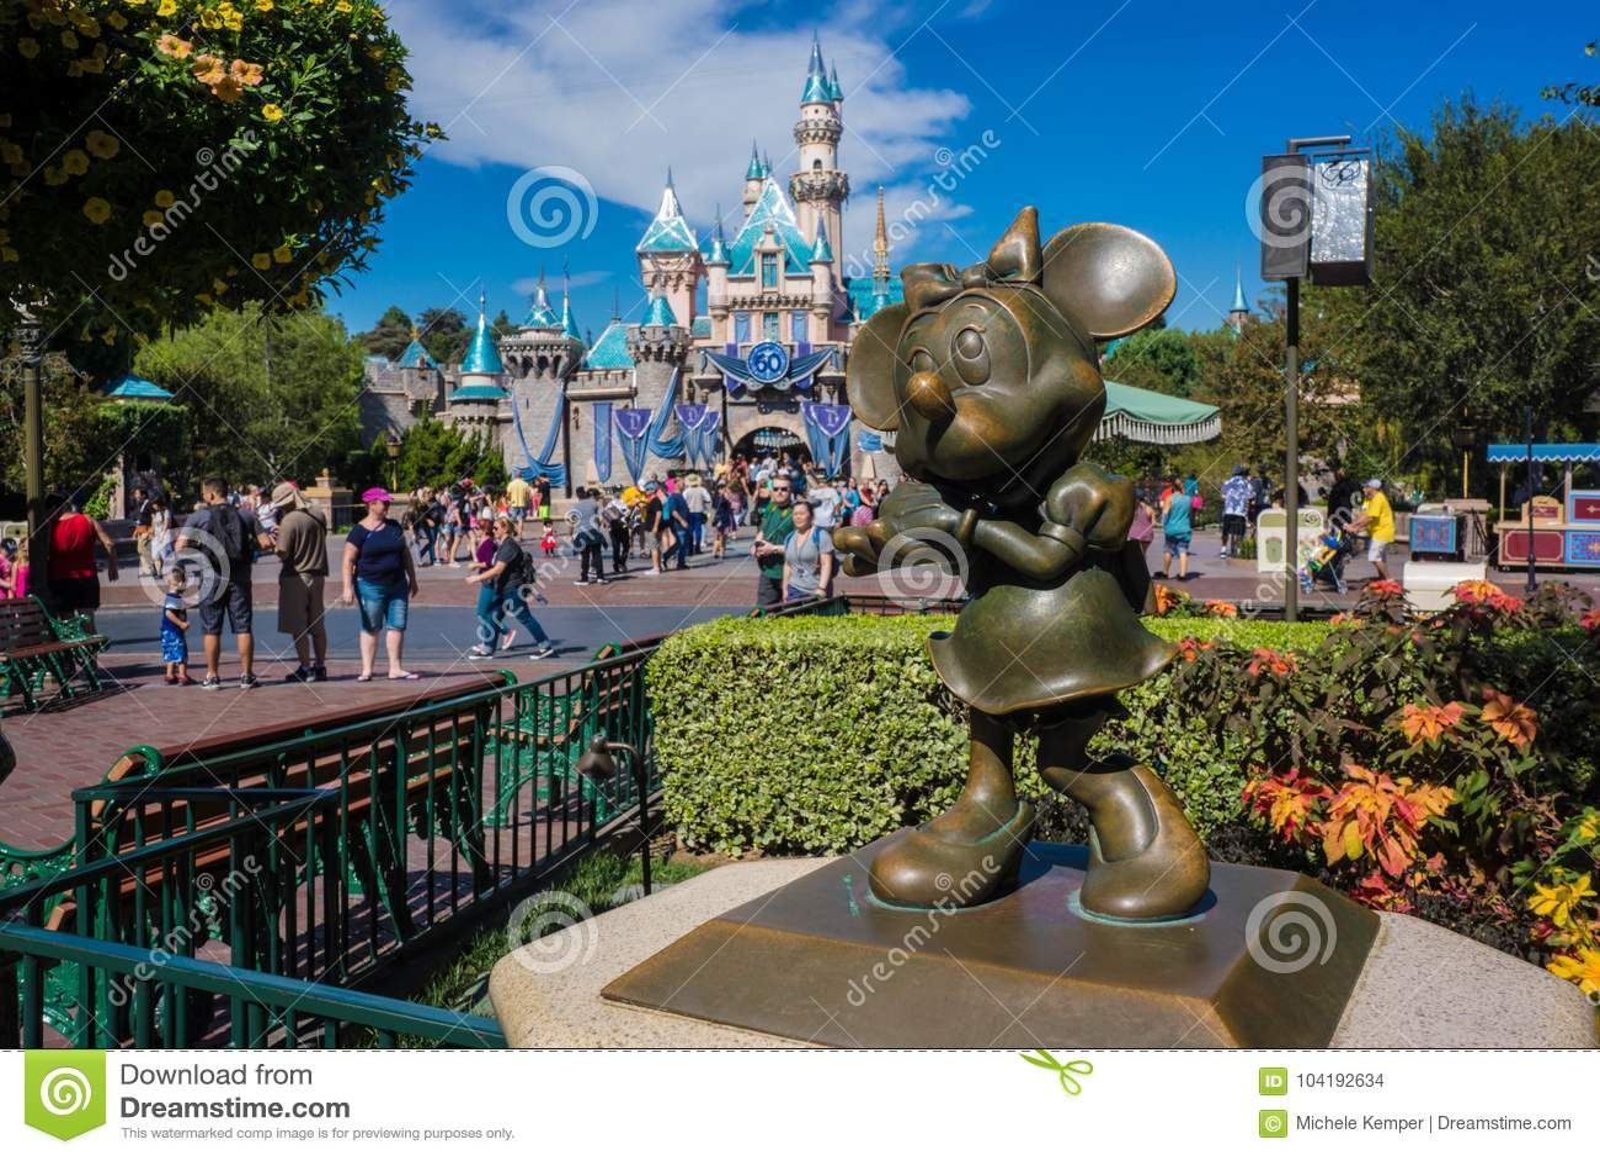 Statue Disneyland de bronze de Minnie Mouse